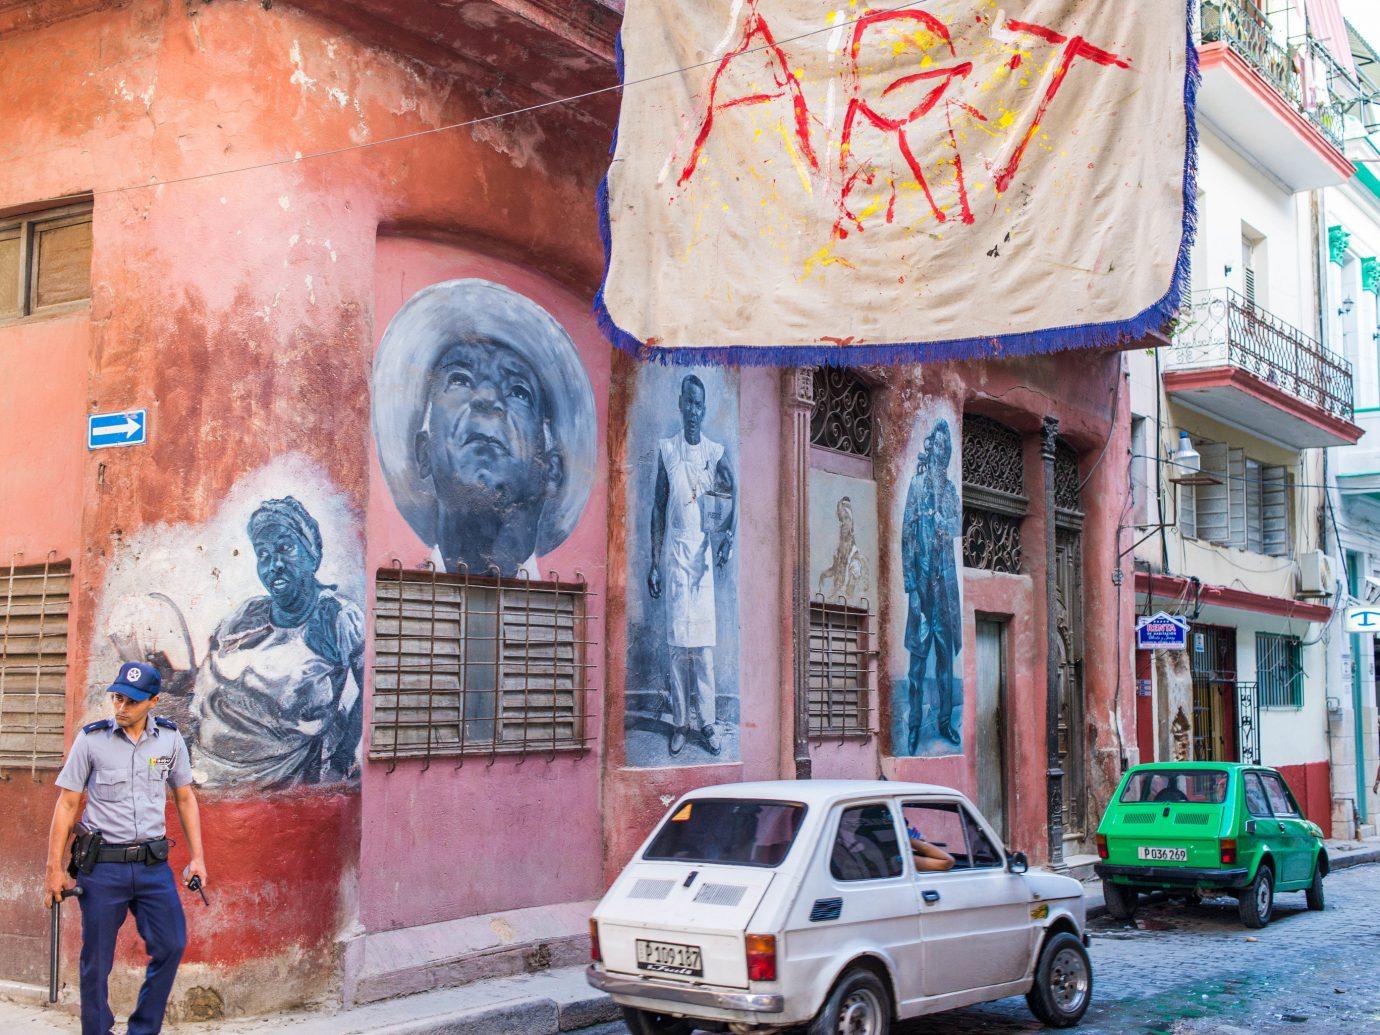 Travel Tips building outdoor color road street urban area parked neighbourhood Town art mural infrastructure graffiti way street art sidewalk